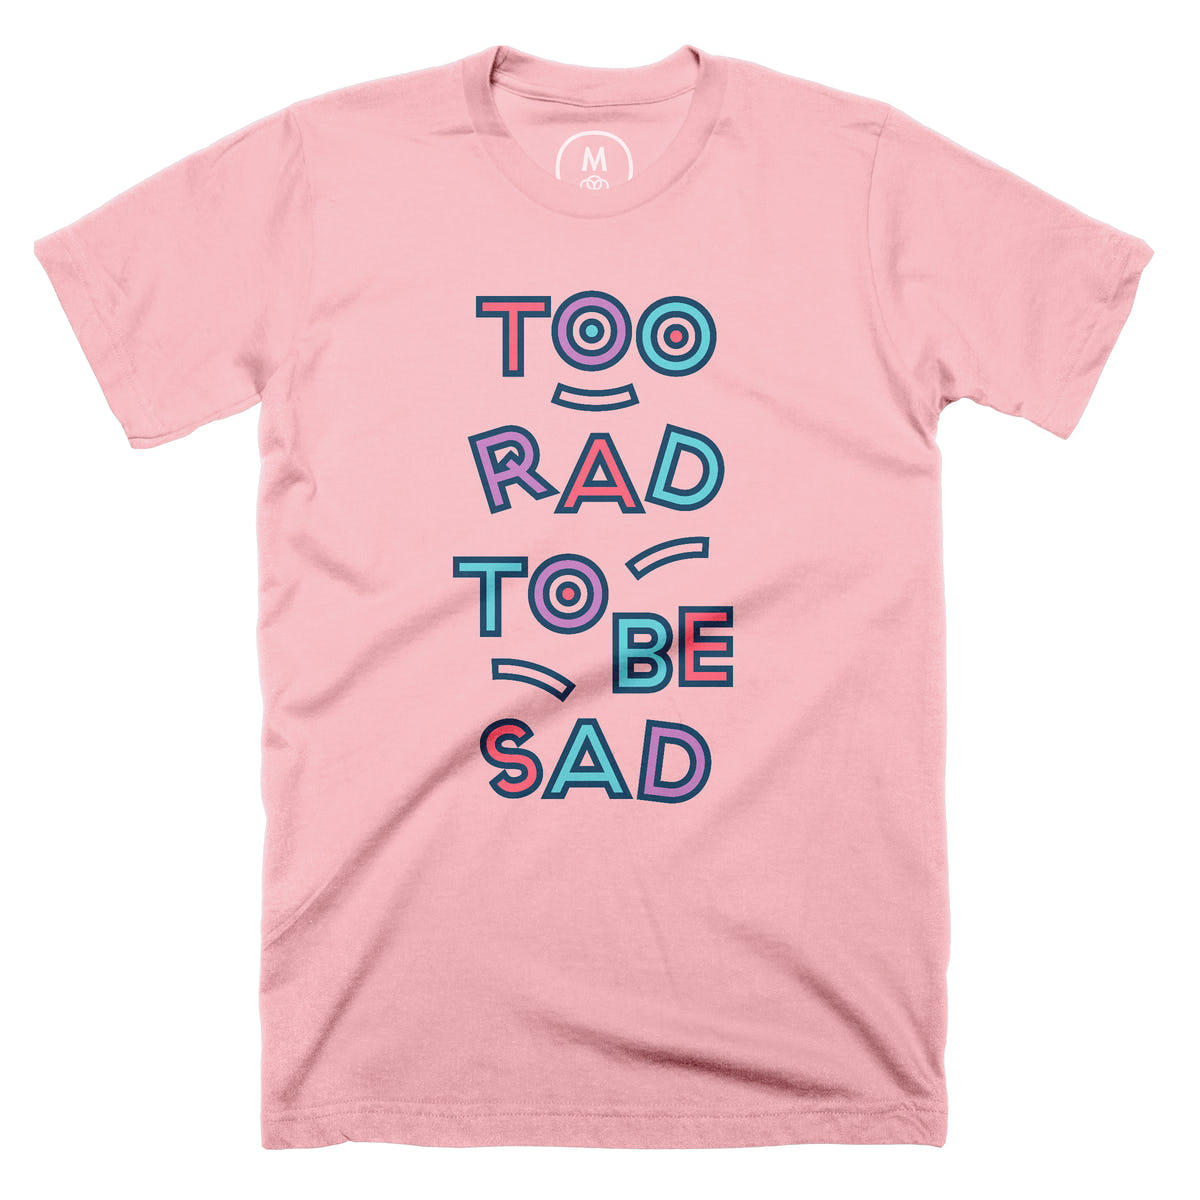 2 Rad 2b Sad Graphic Tee And Pullover Crewneck By Meg